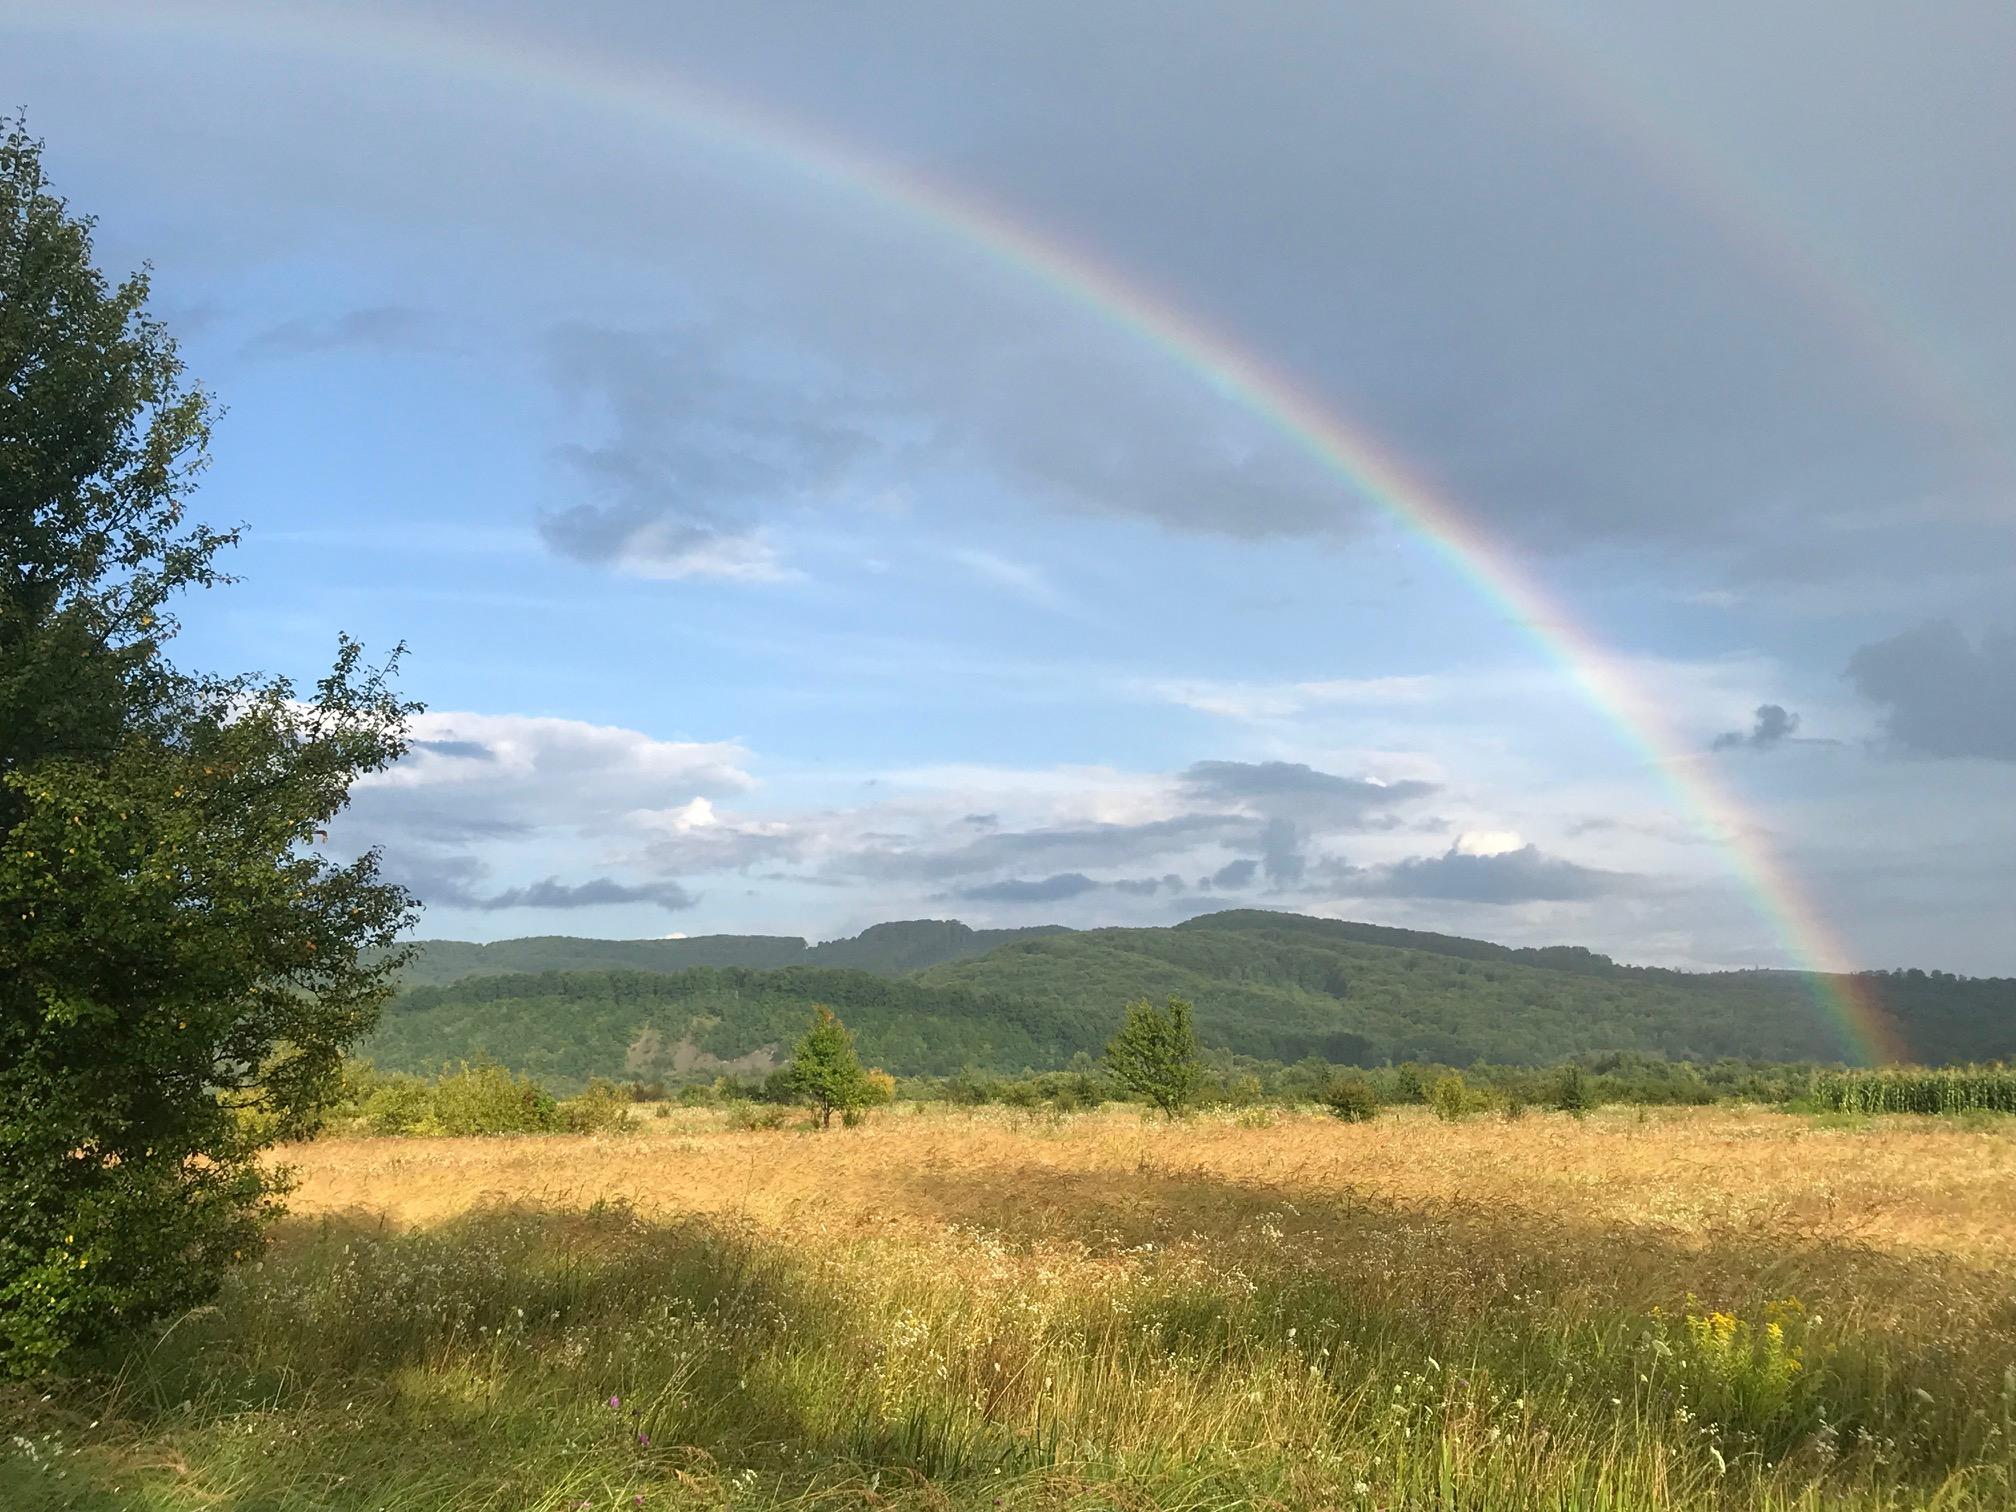 Beautiful rainbow in Ukraine